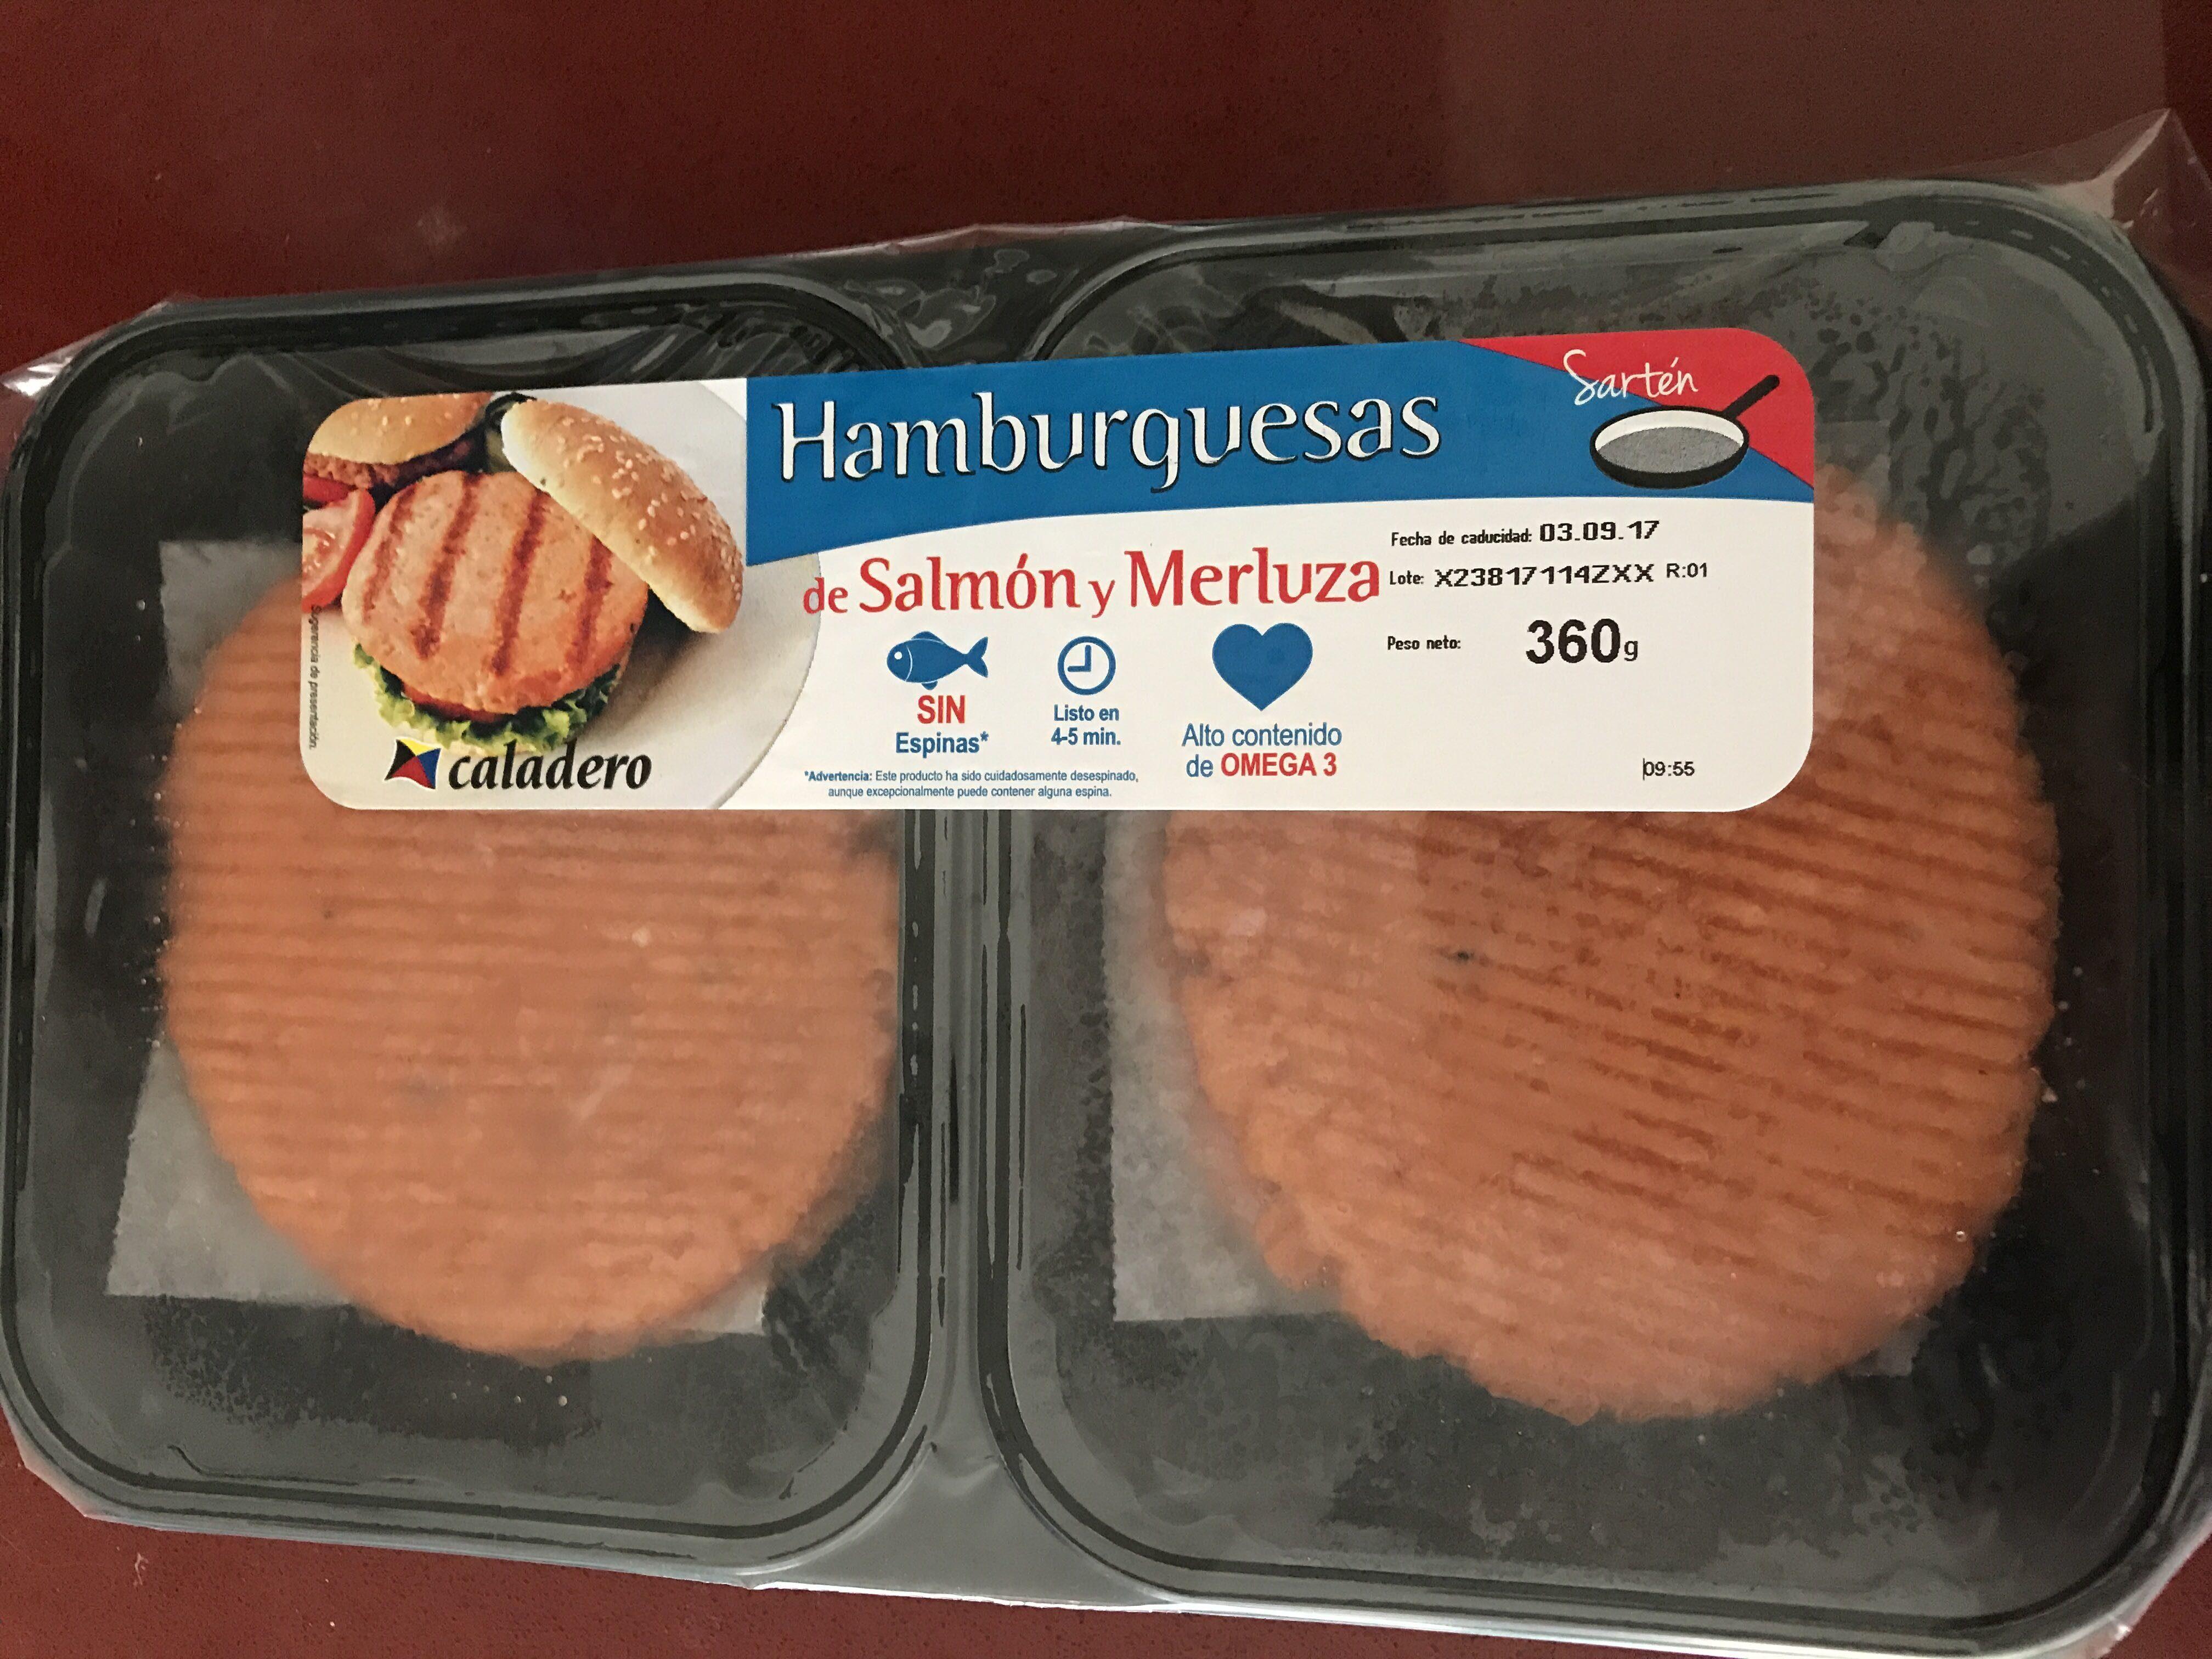 Hamburguesas de salmón y merluza - Product